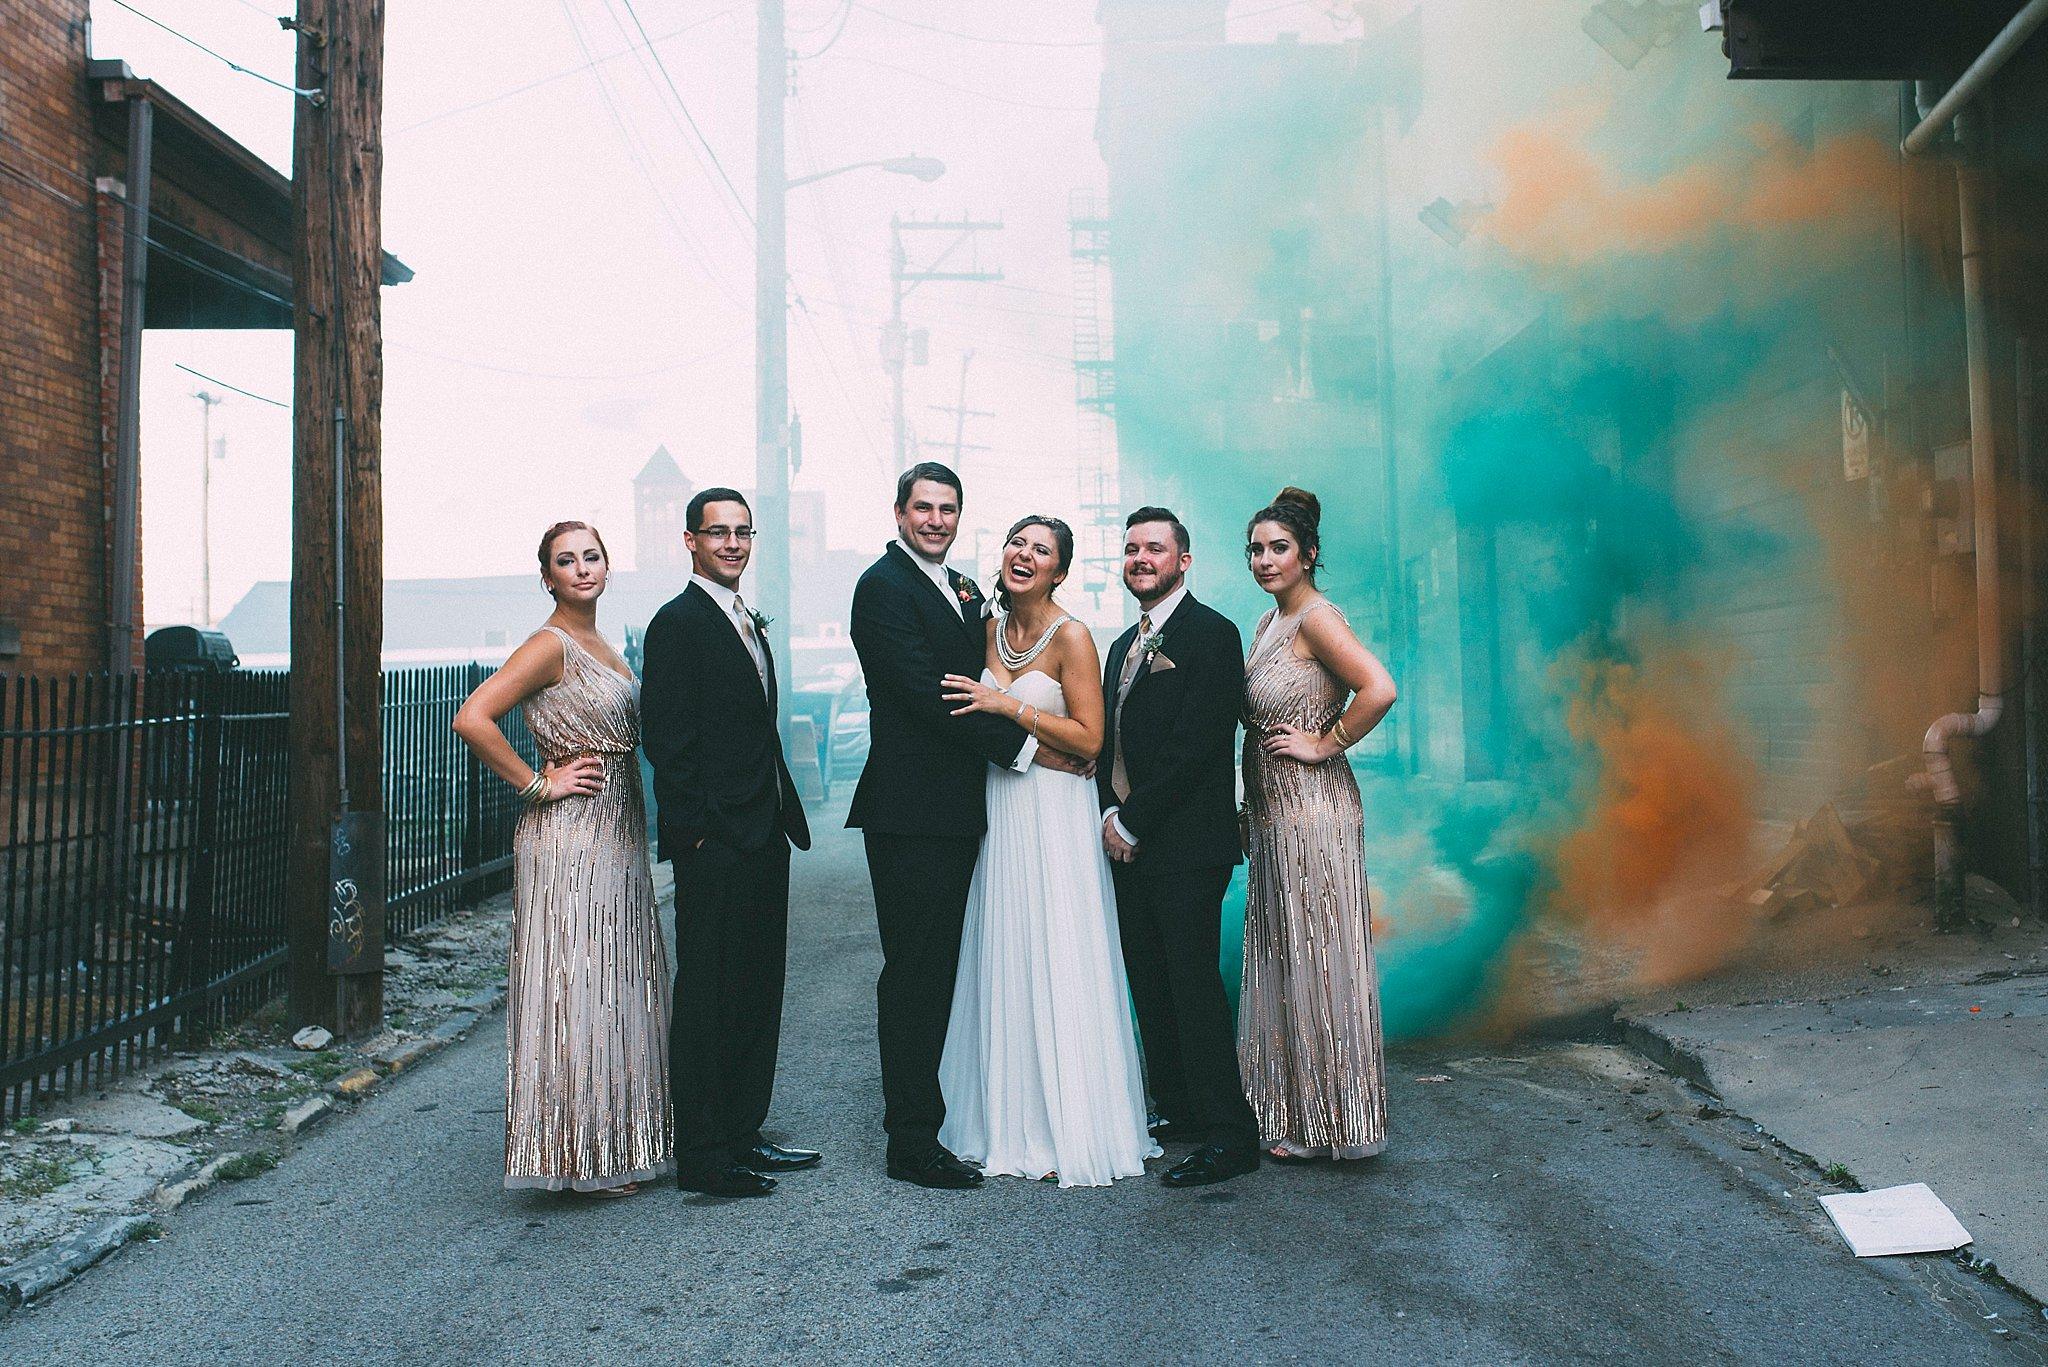 Smoke Bomb wedding pictures